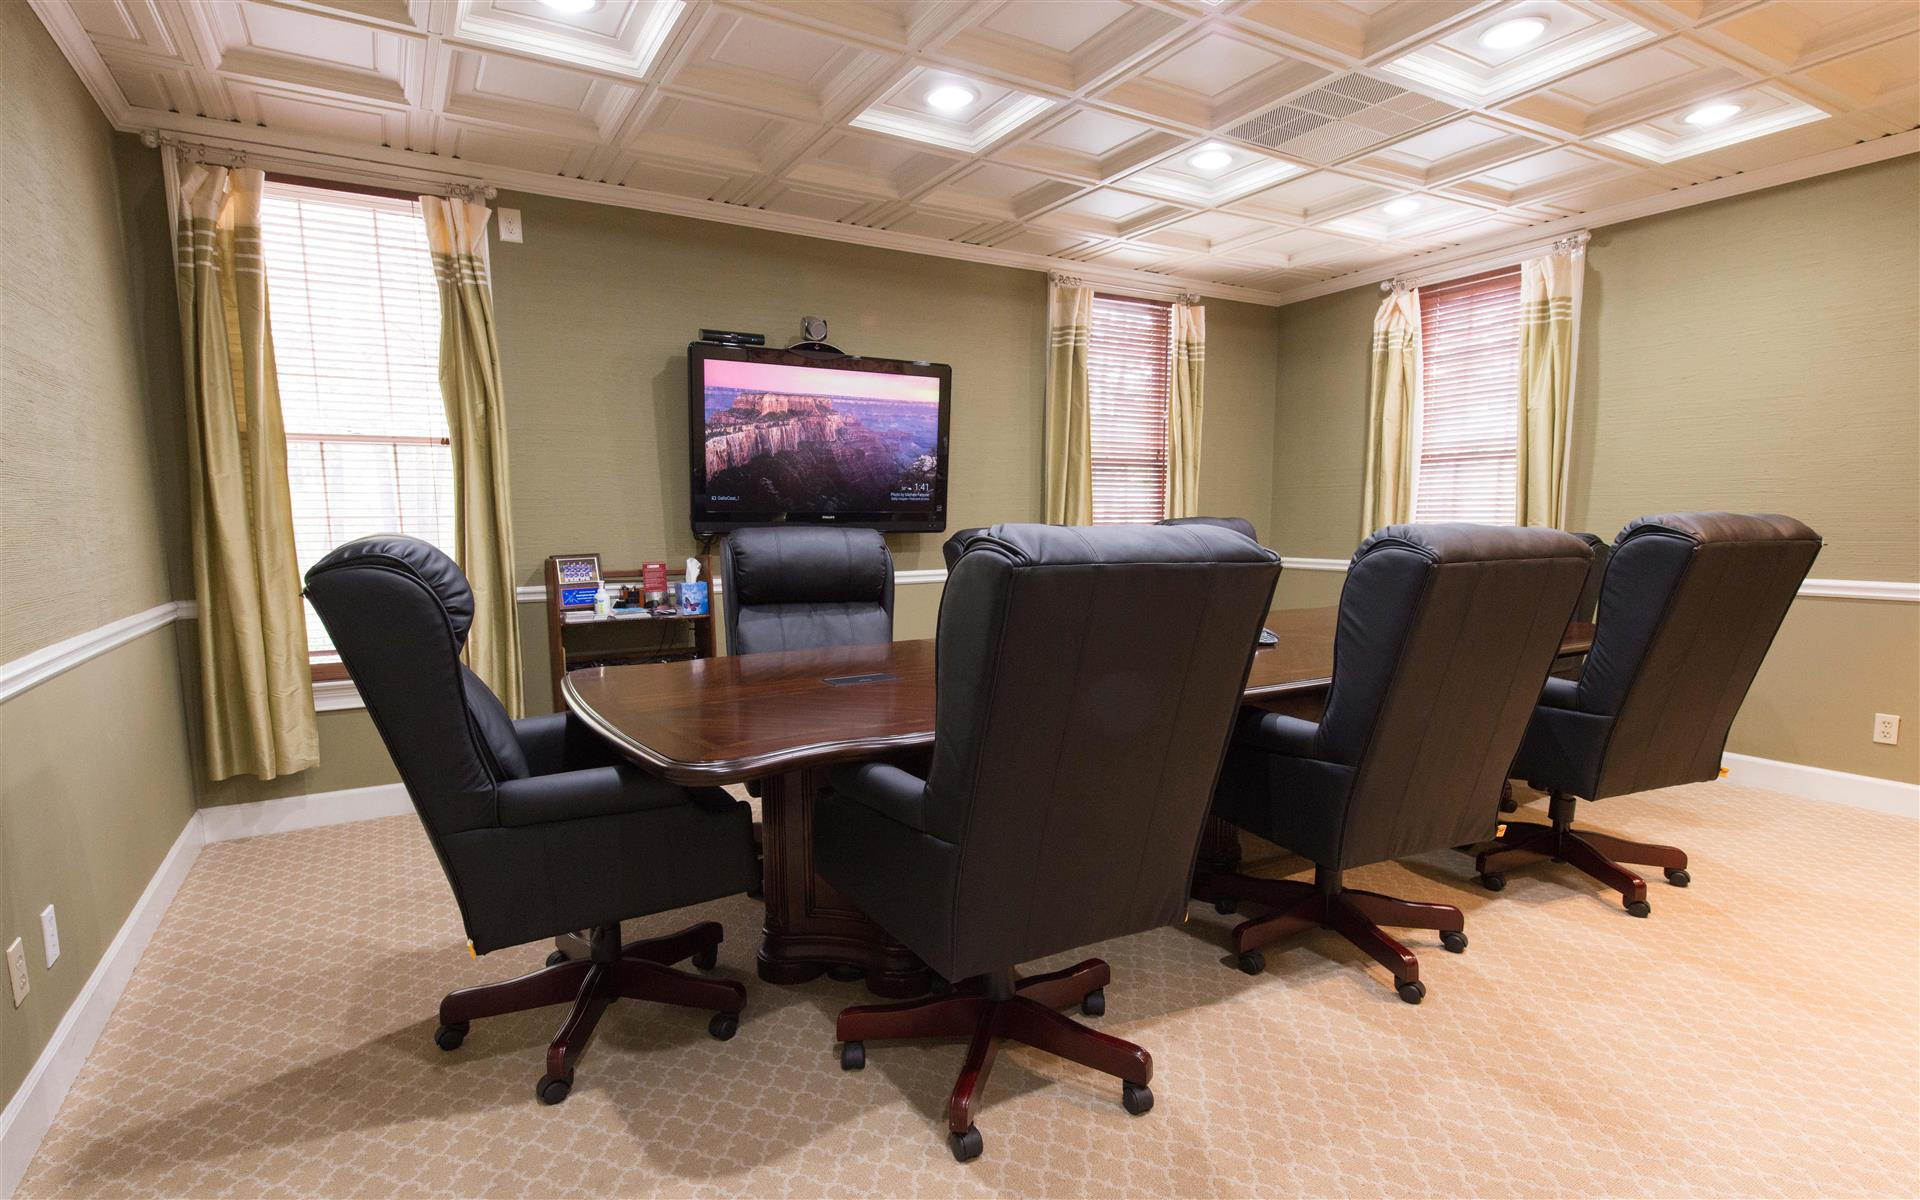 Elizabeth Gallo Court Reporting - Birch Boardroom